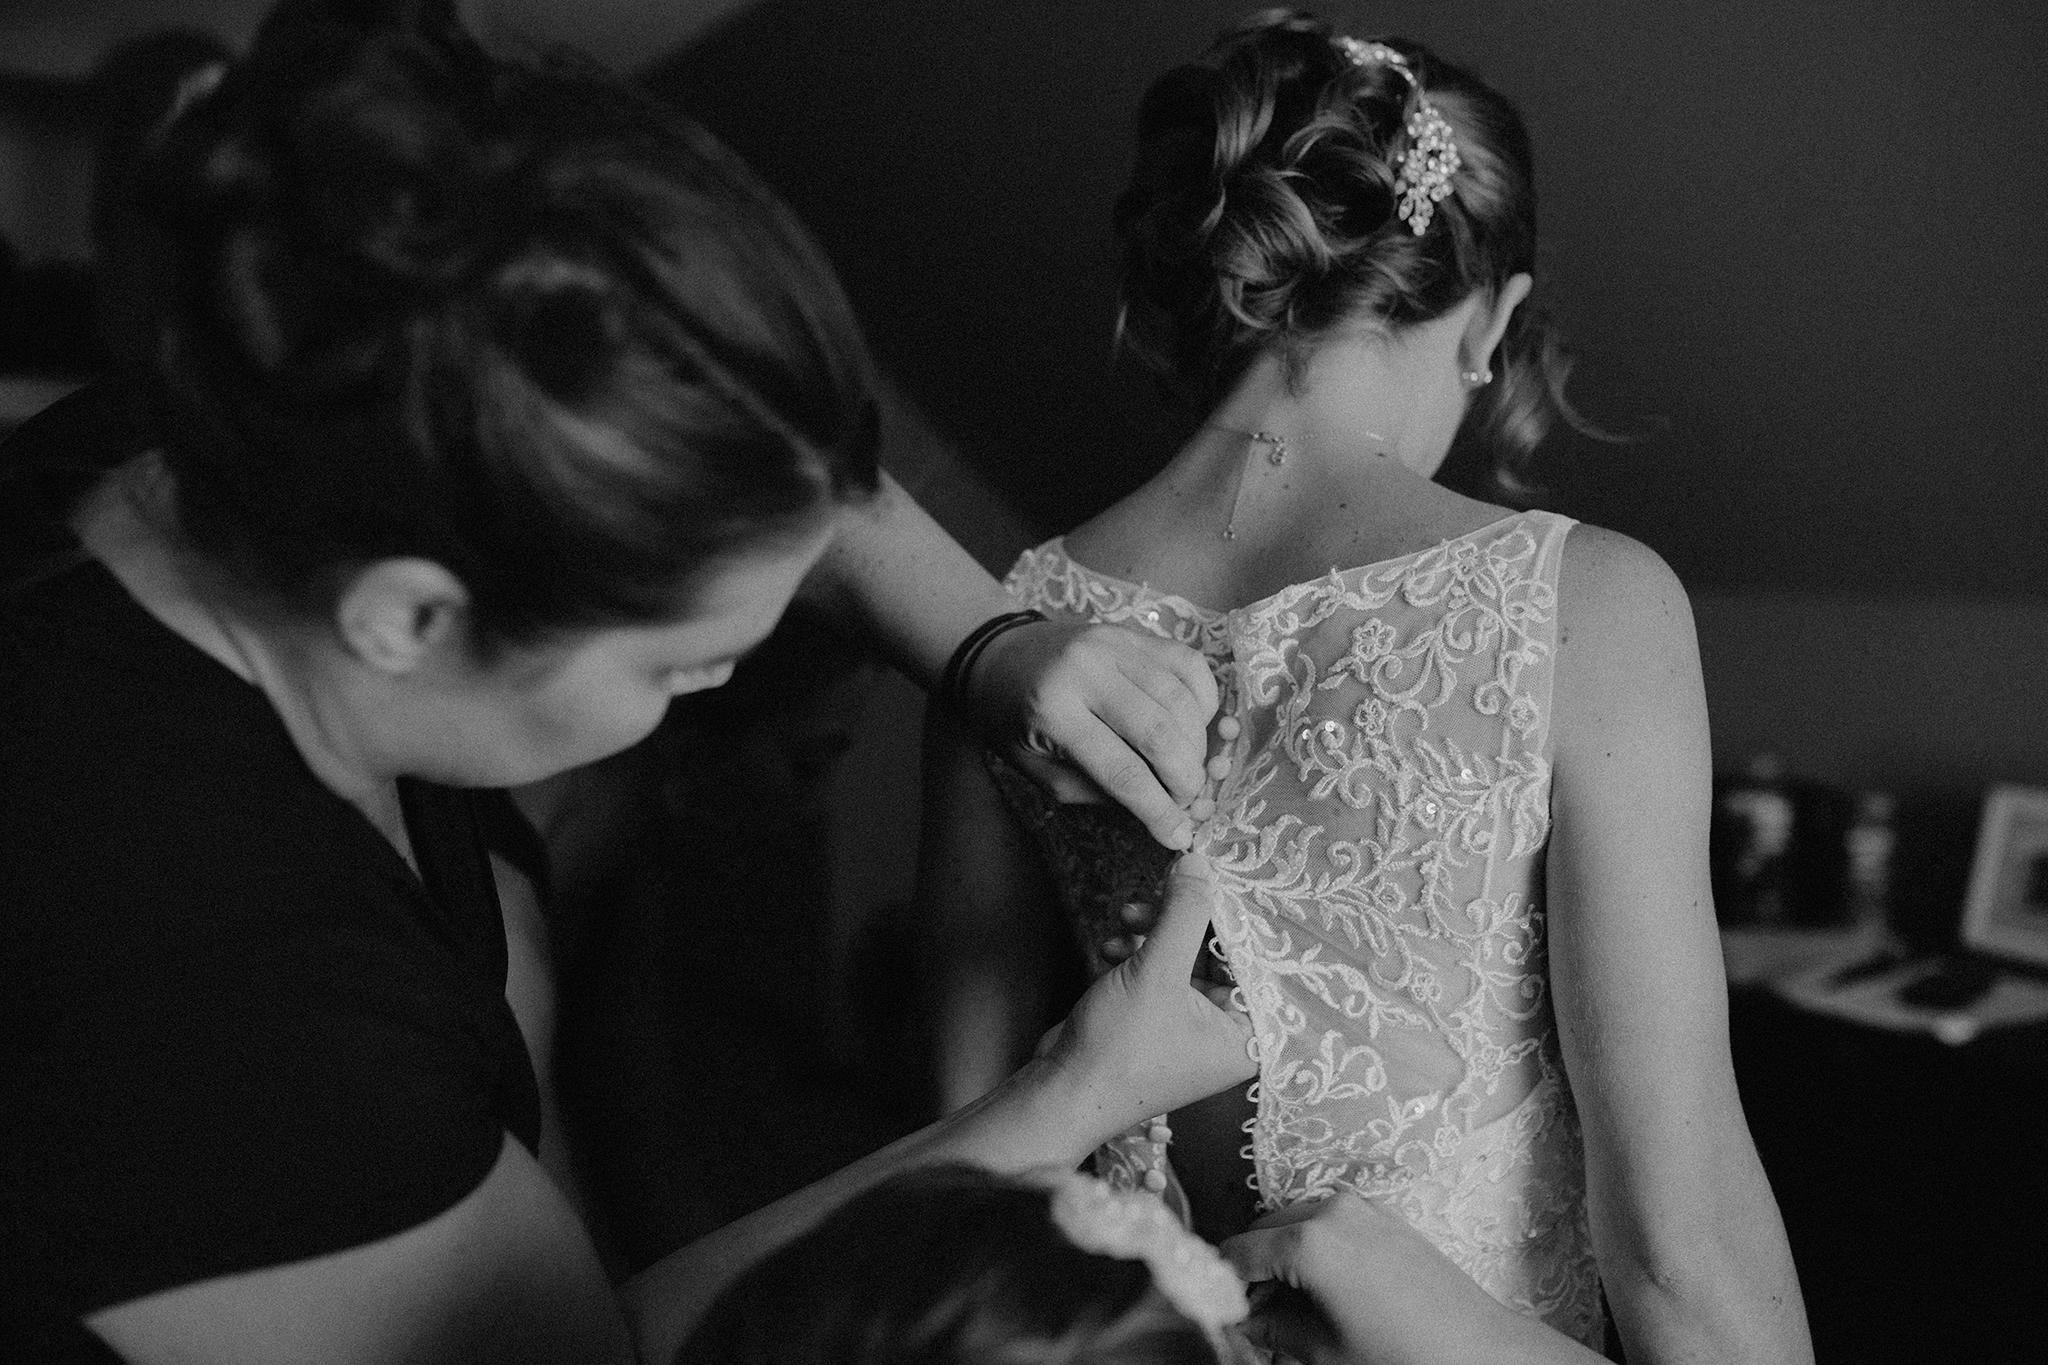 vermont-wedding-photographer-bride-getting-ready-2.jpg